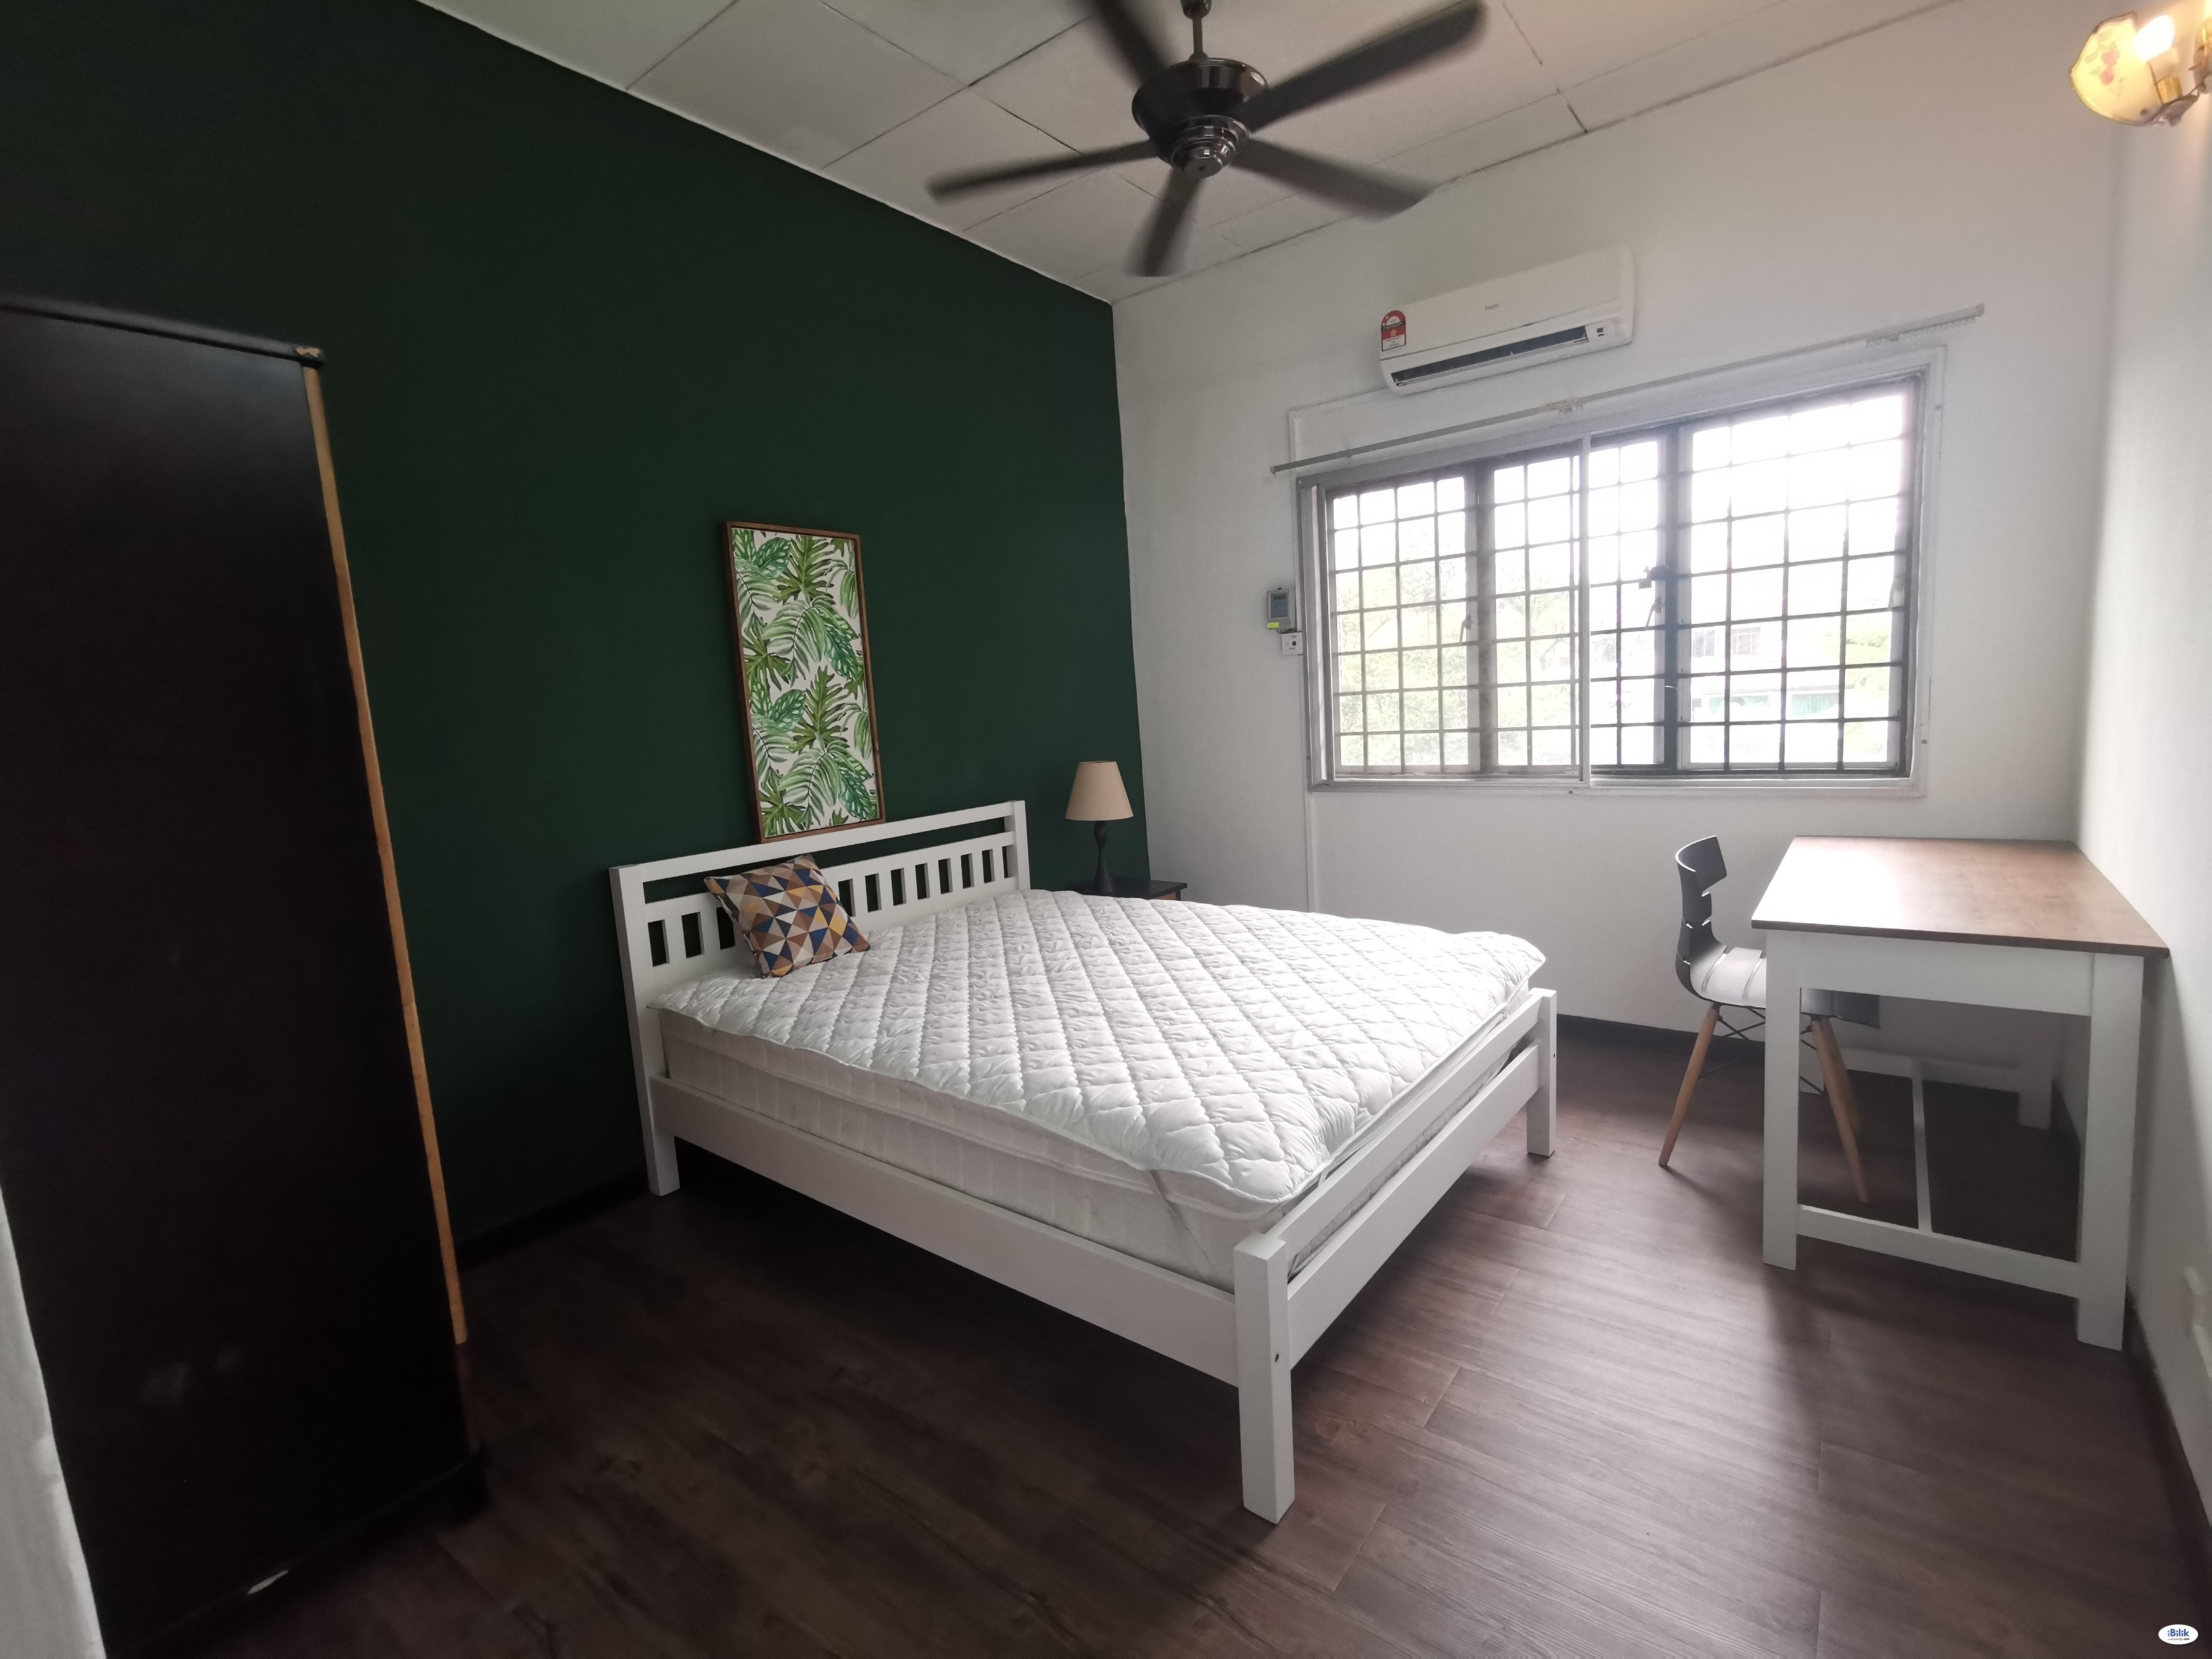 Bandar Utama MRT Homestay Rooms for Rent Petaling Jaya